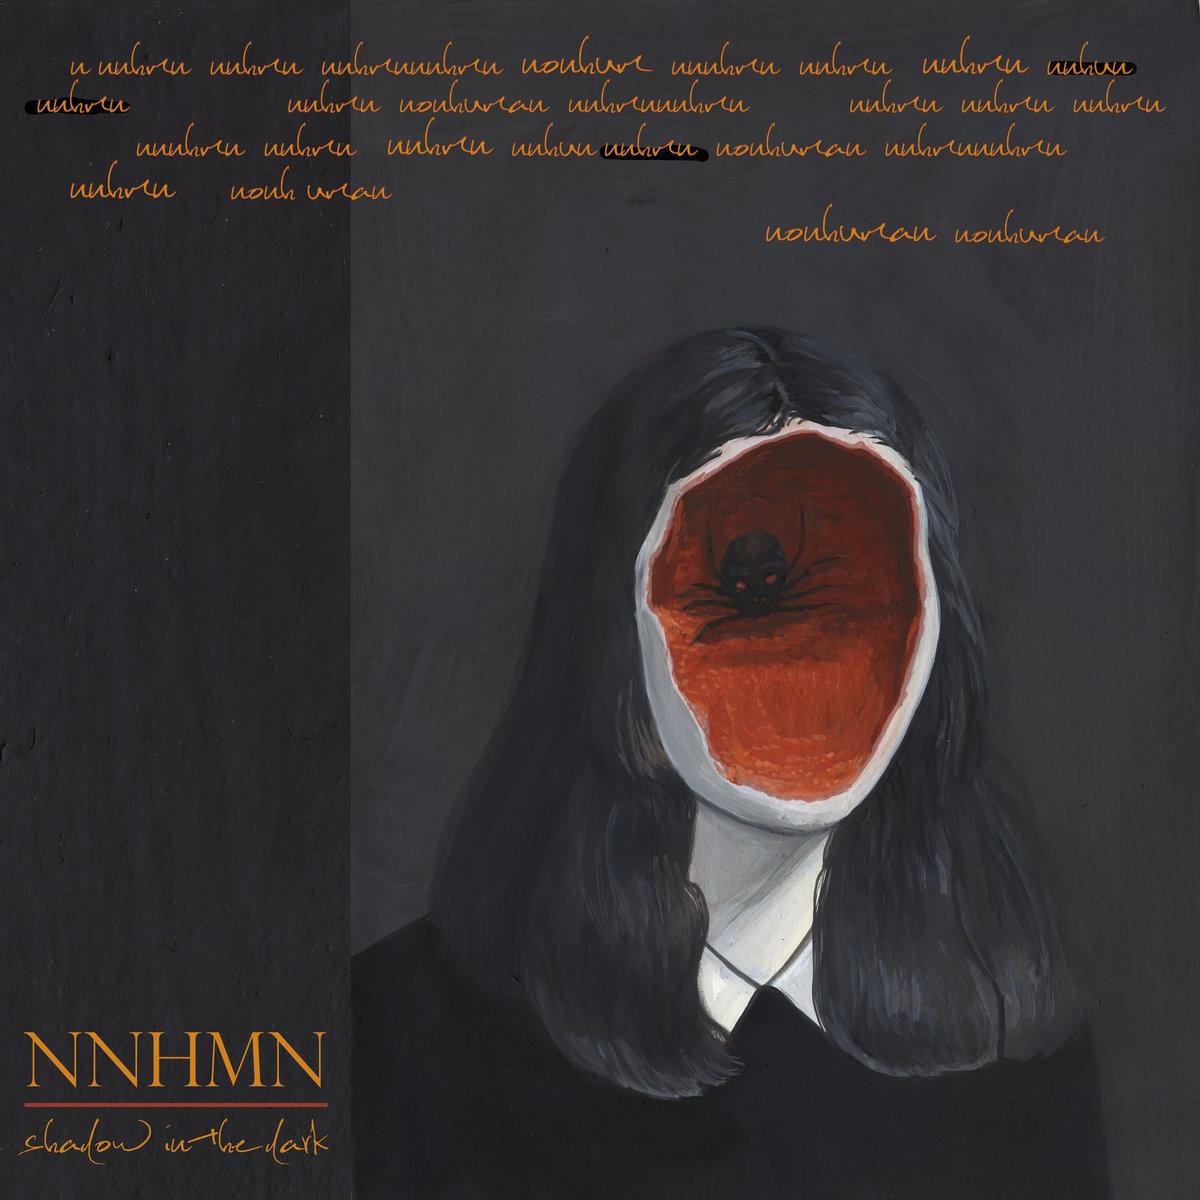 NNHMN - Shadows In The Dark (LP; 2020)